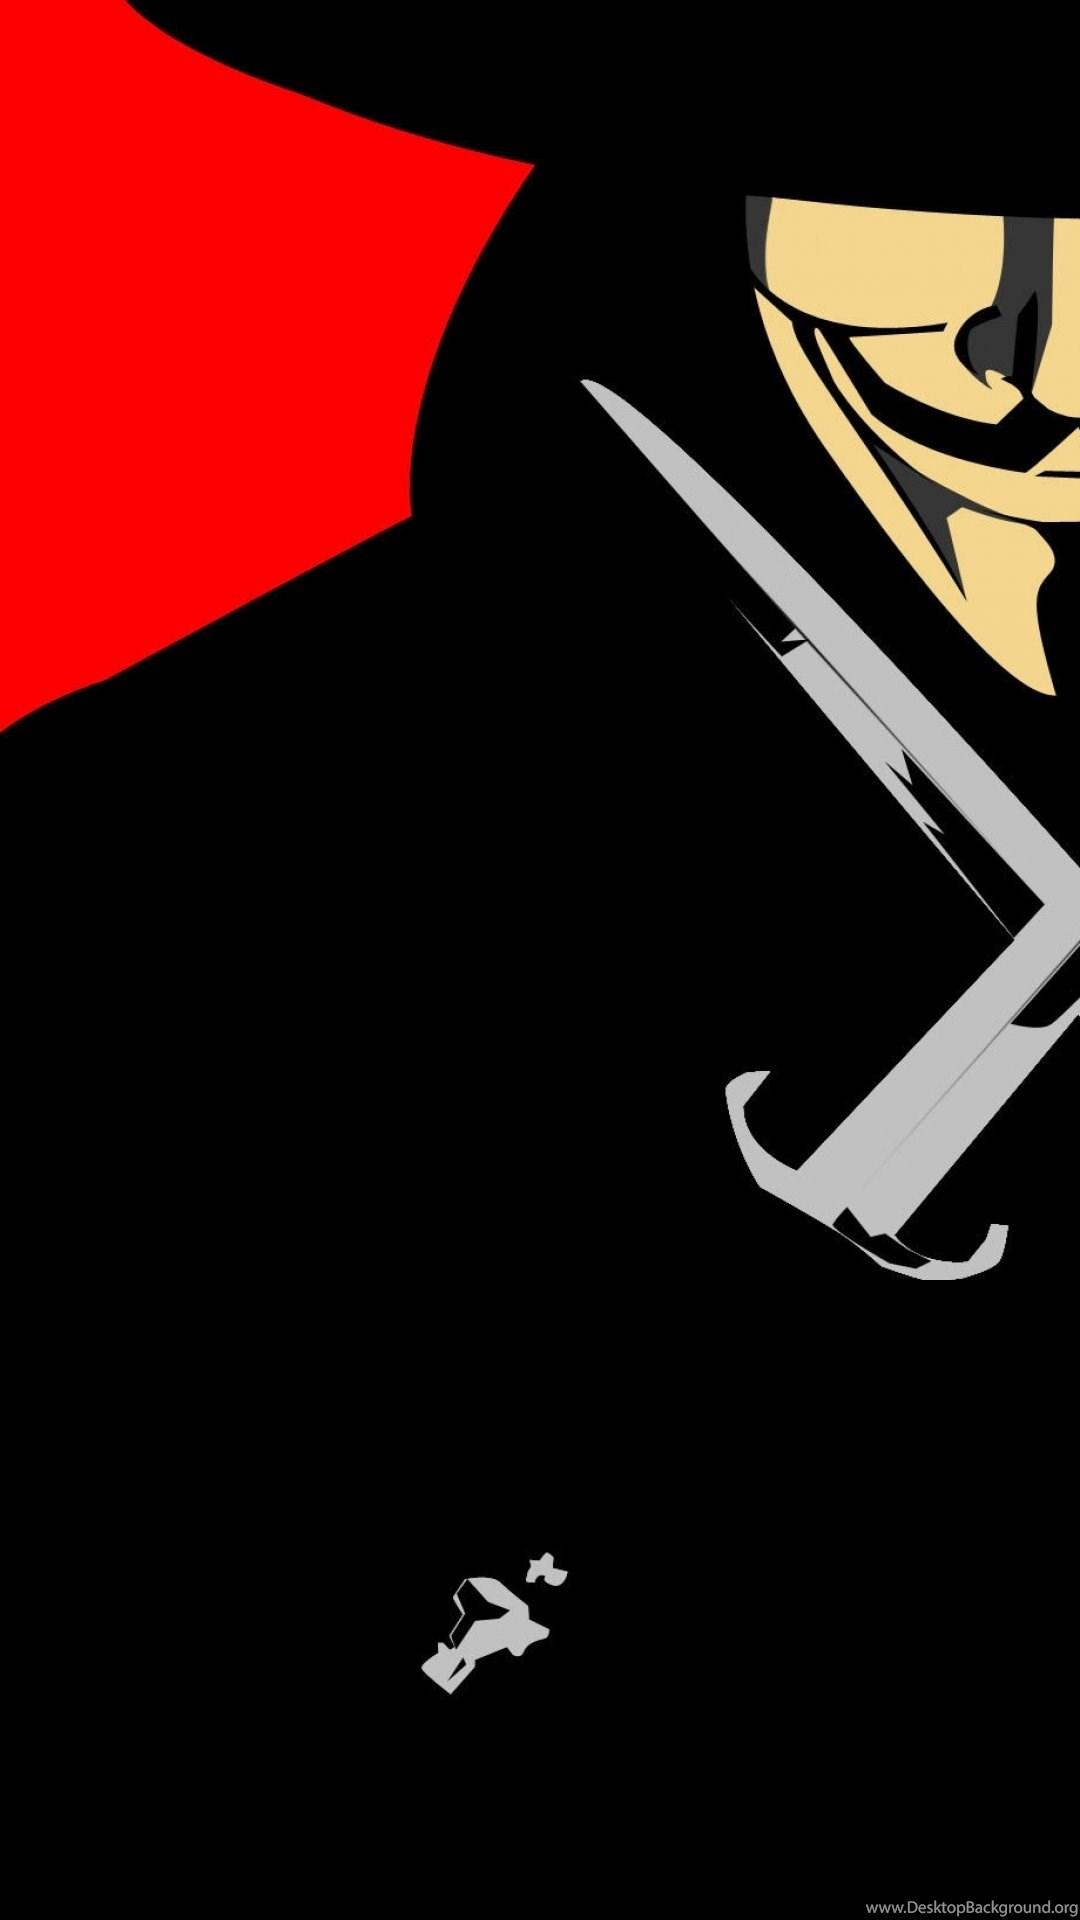 IPhone 6 Plus Movie V For Vendetta Wallpapers ID 78728 Desktop